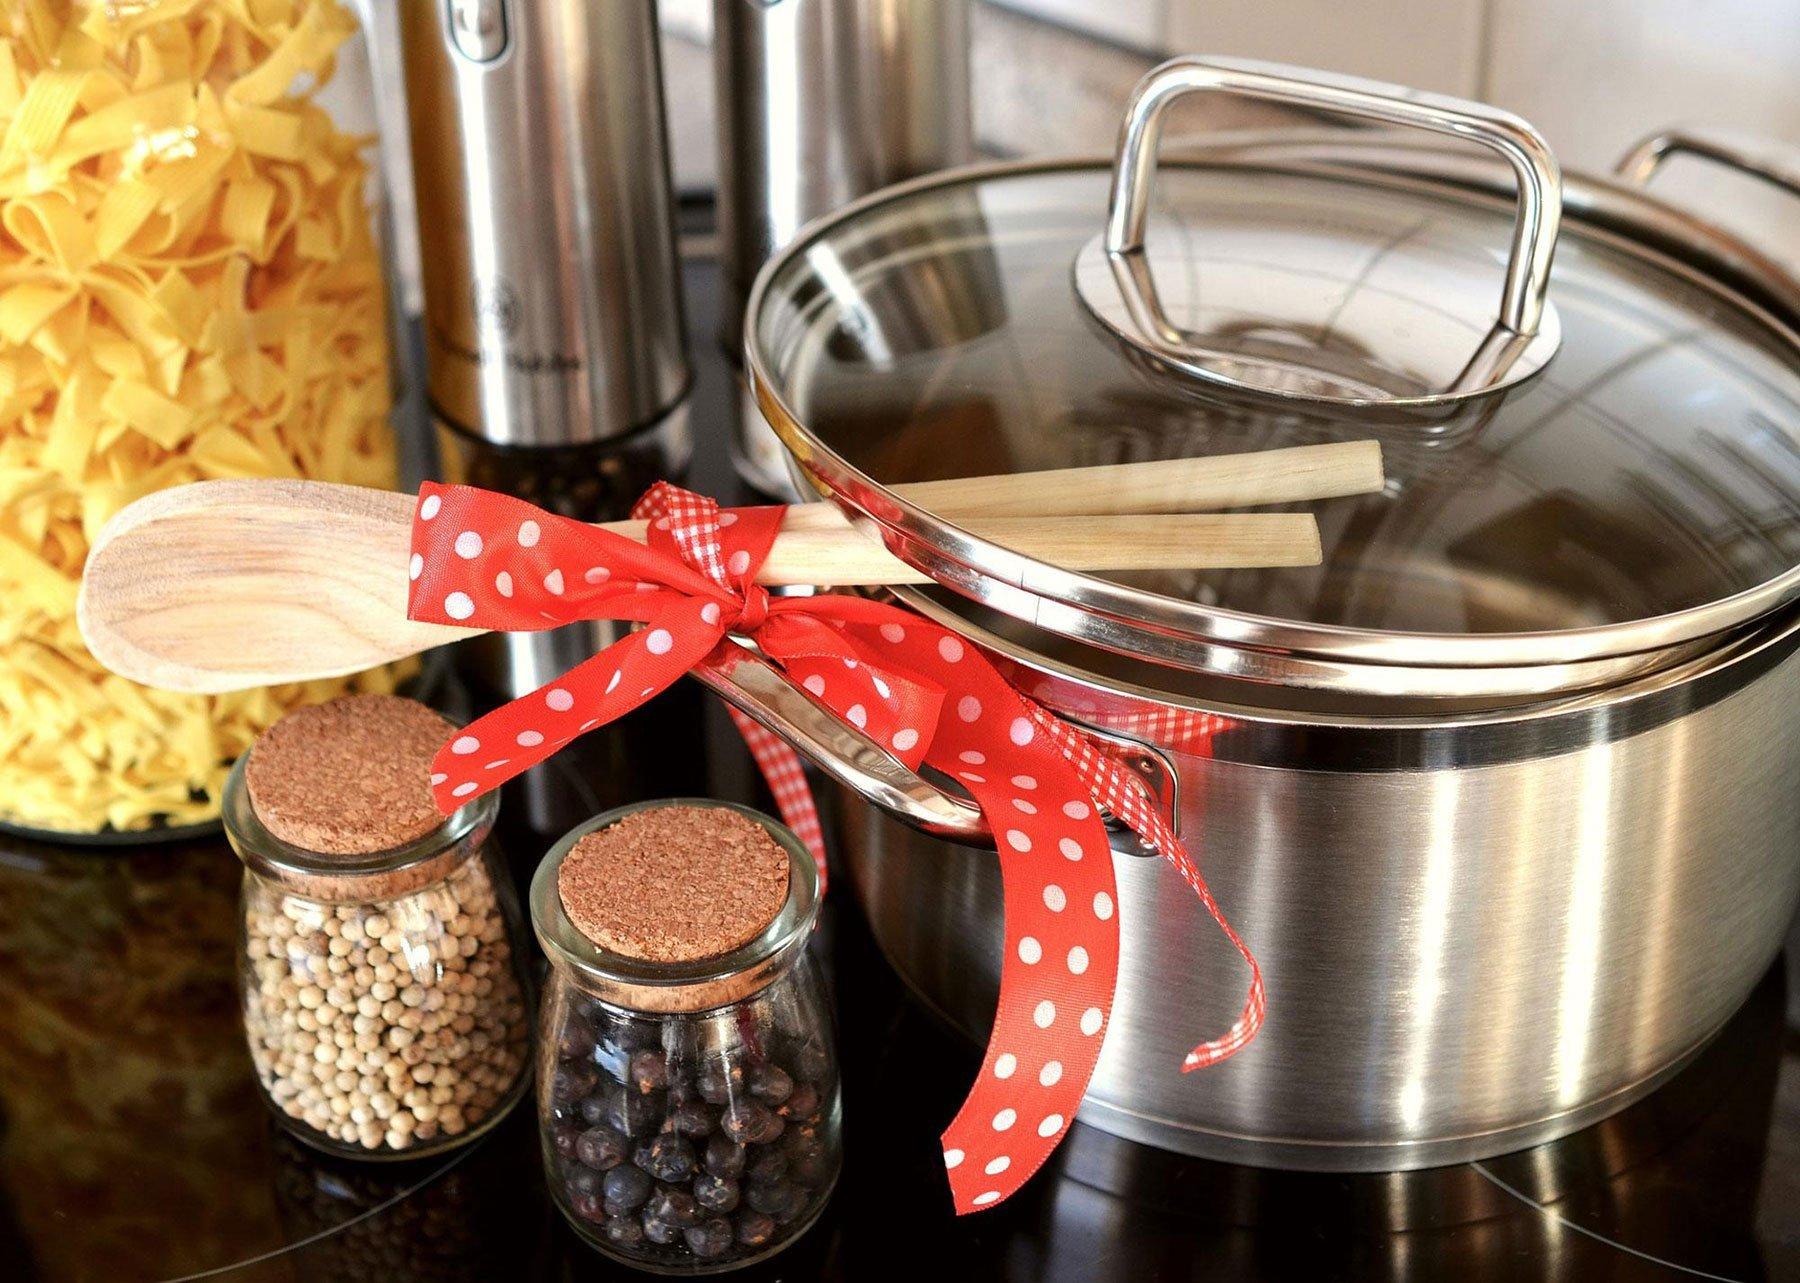 Pasta, ortaggi, utensili e pentola